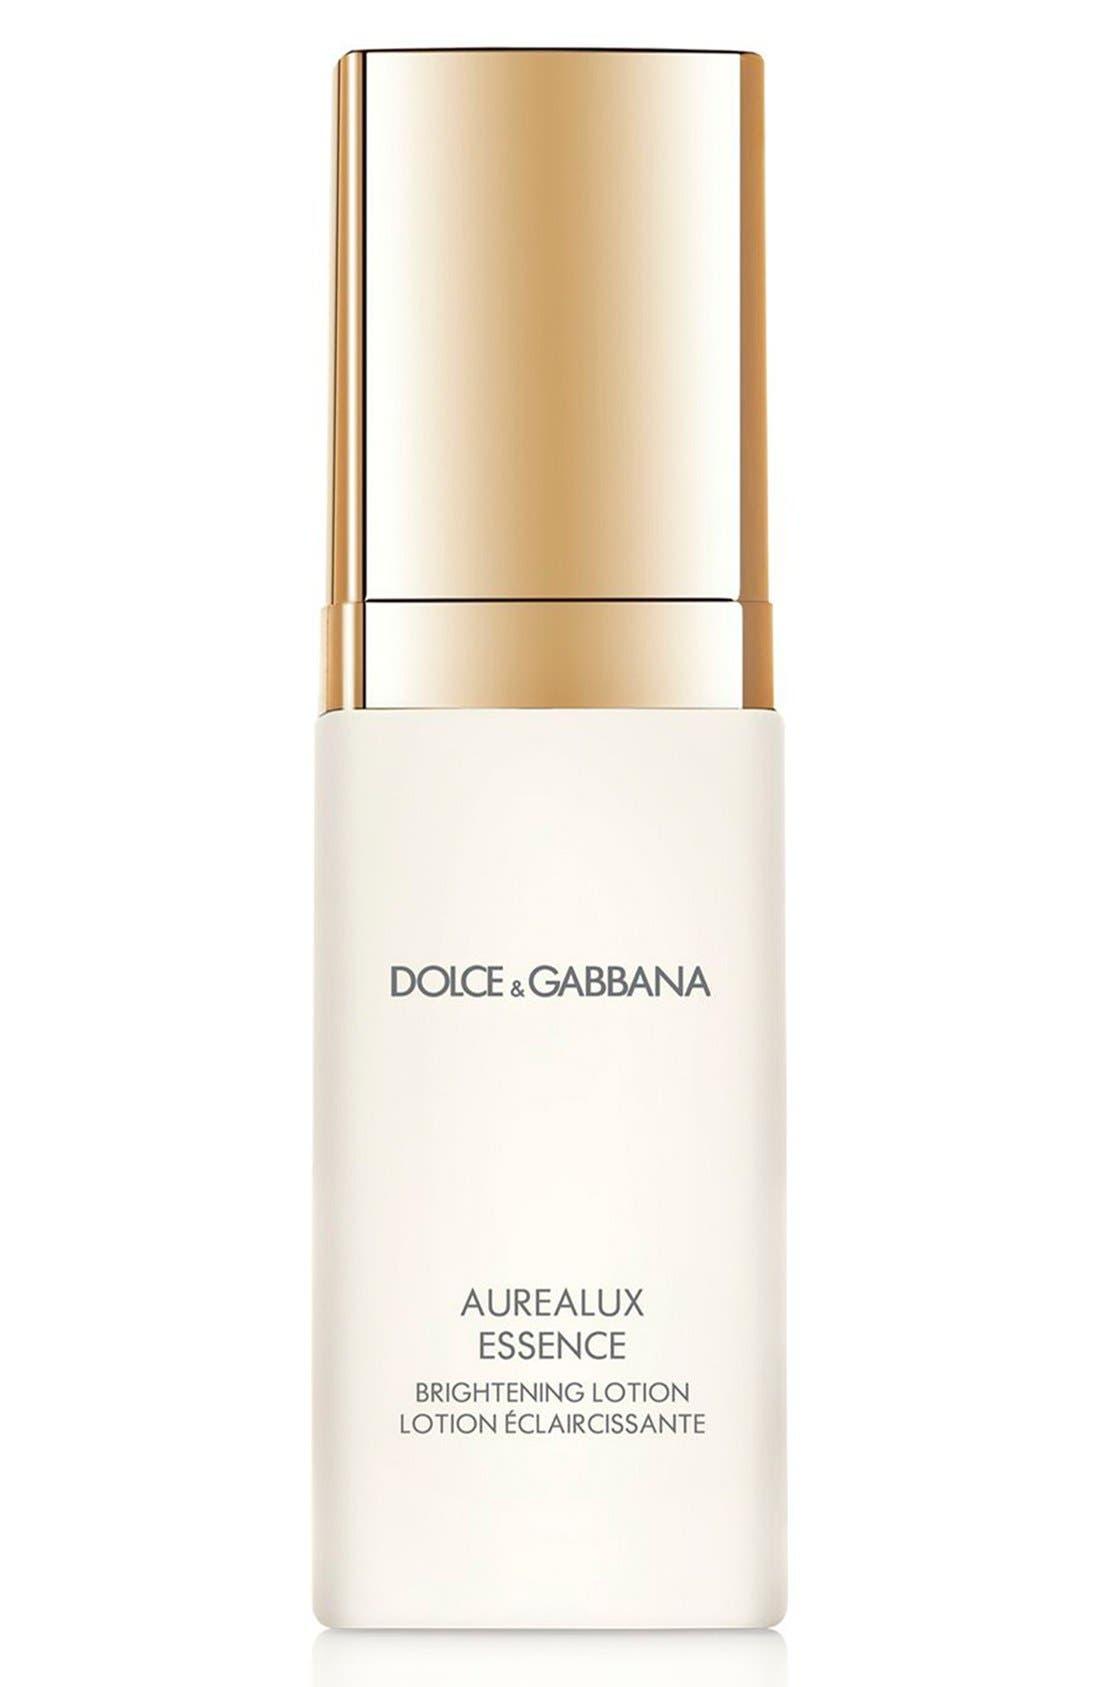 Dolce&GabbanaBeauty 'Aurealux' Essence Brightening Lotion,                         Main,                         color, 000